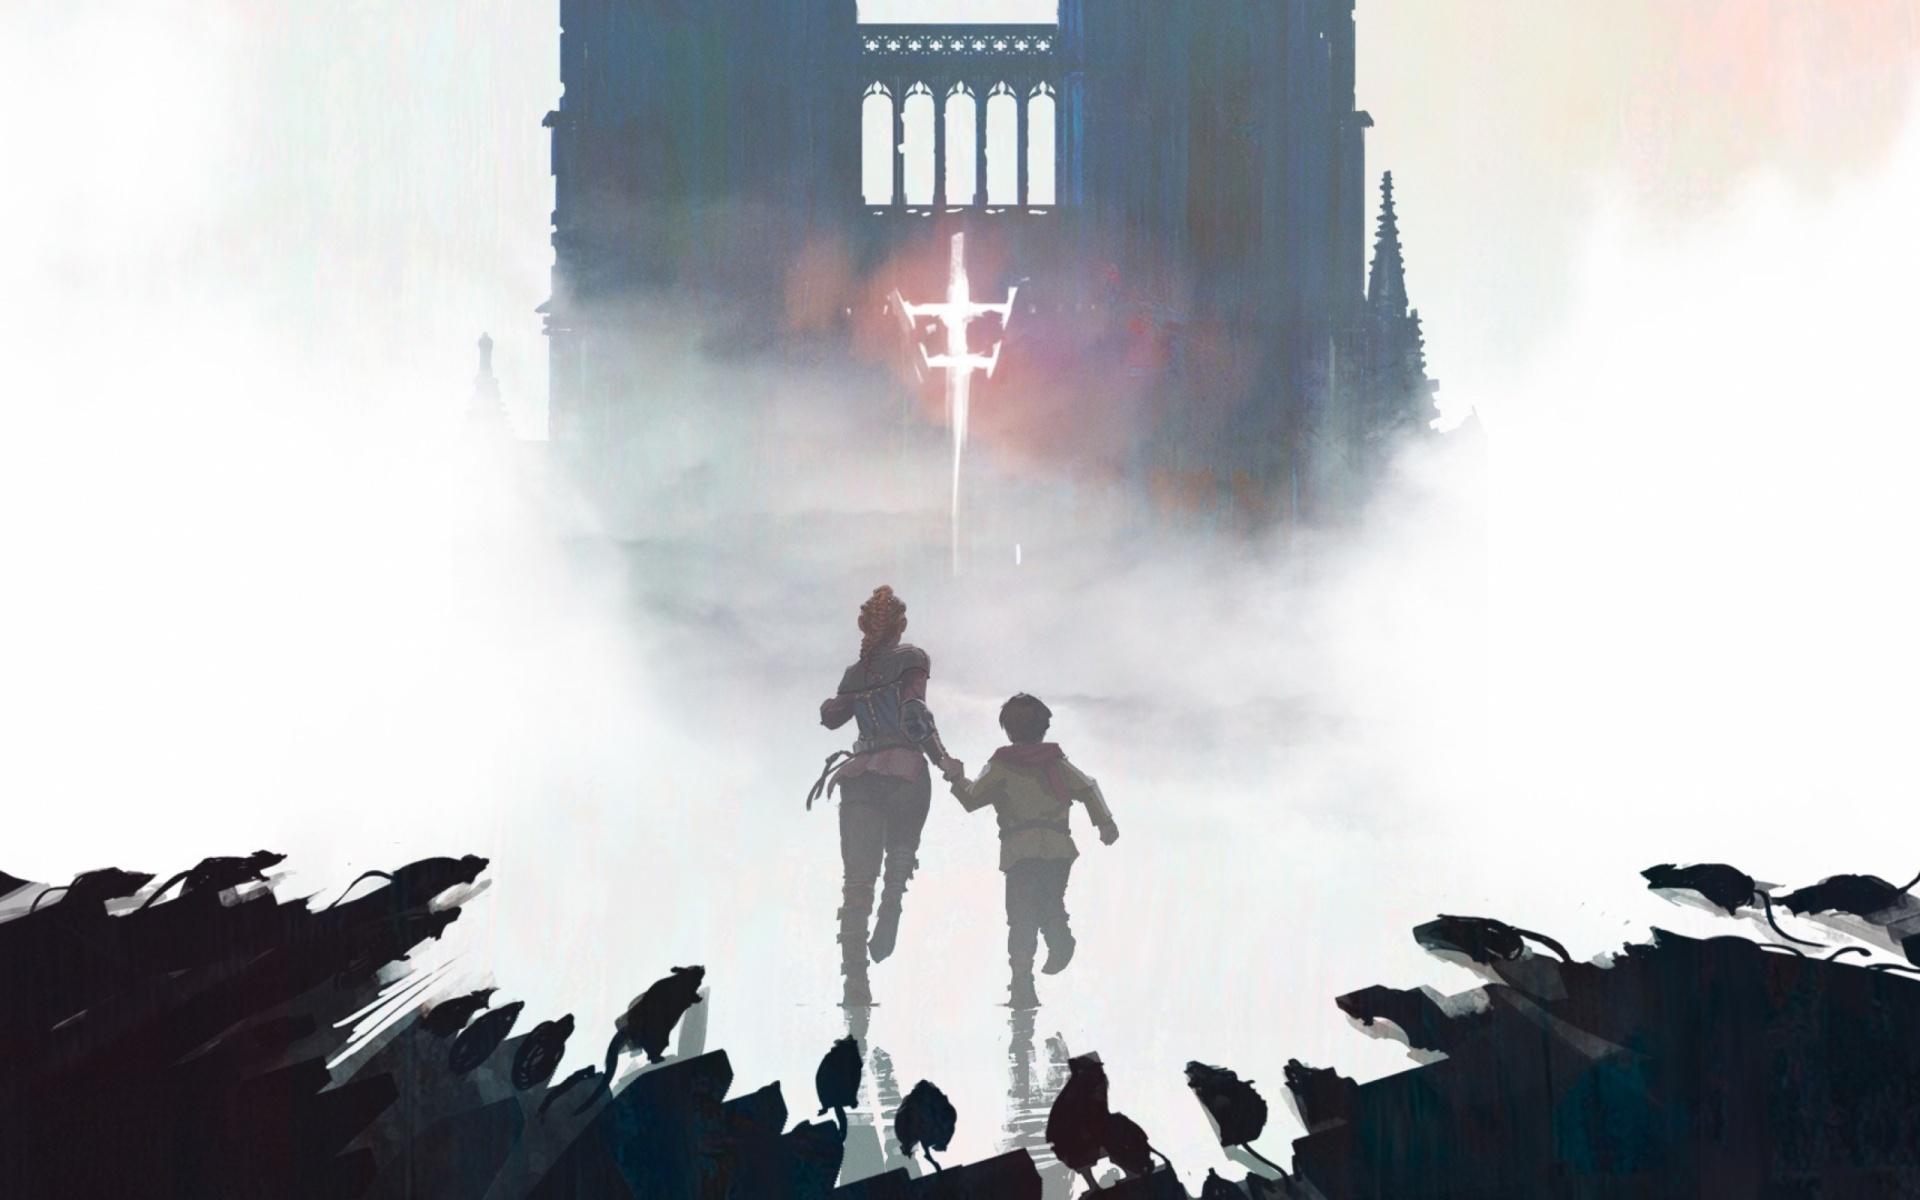 RAGE2, A Plague Tale: Innocence, Tekken7, Arma 3: свежие скидки в Steam